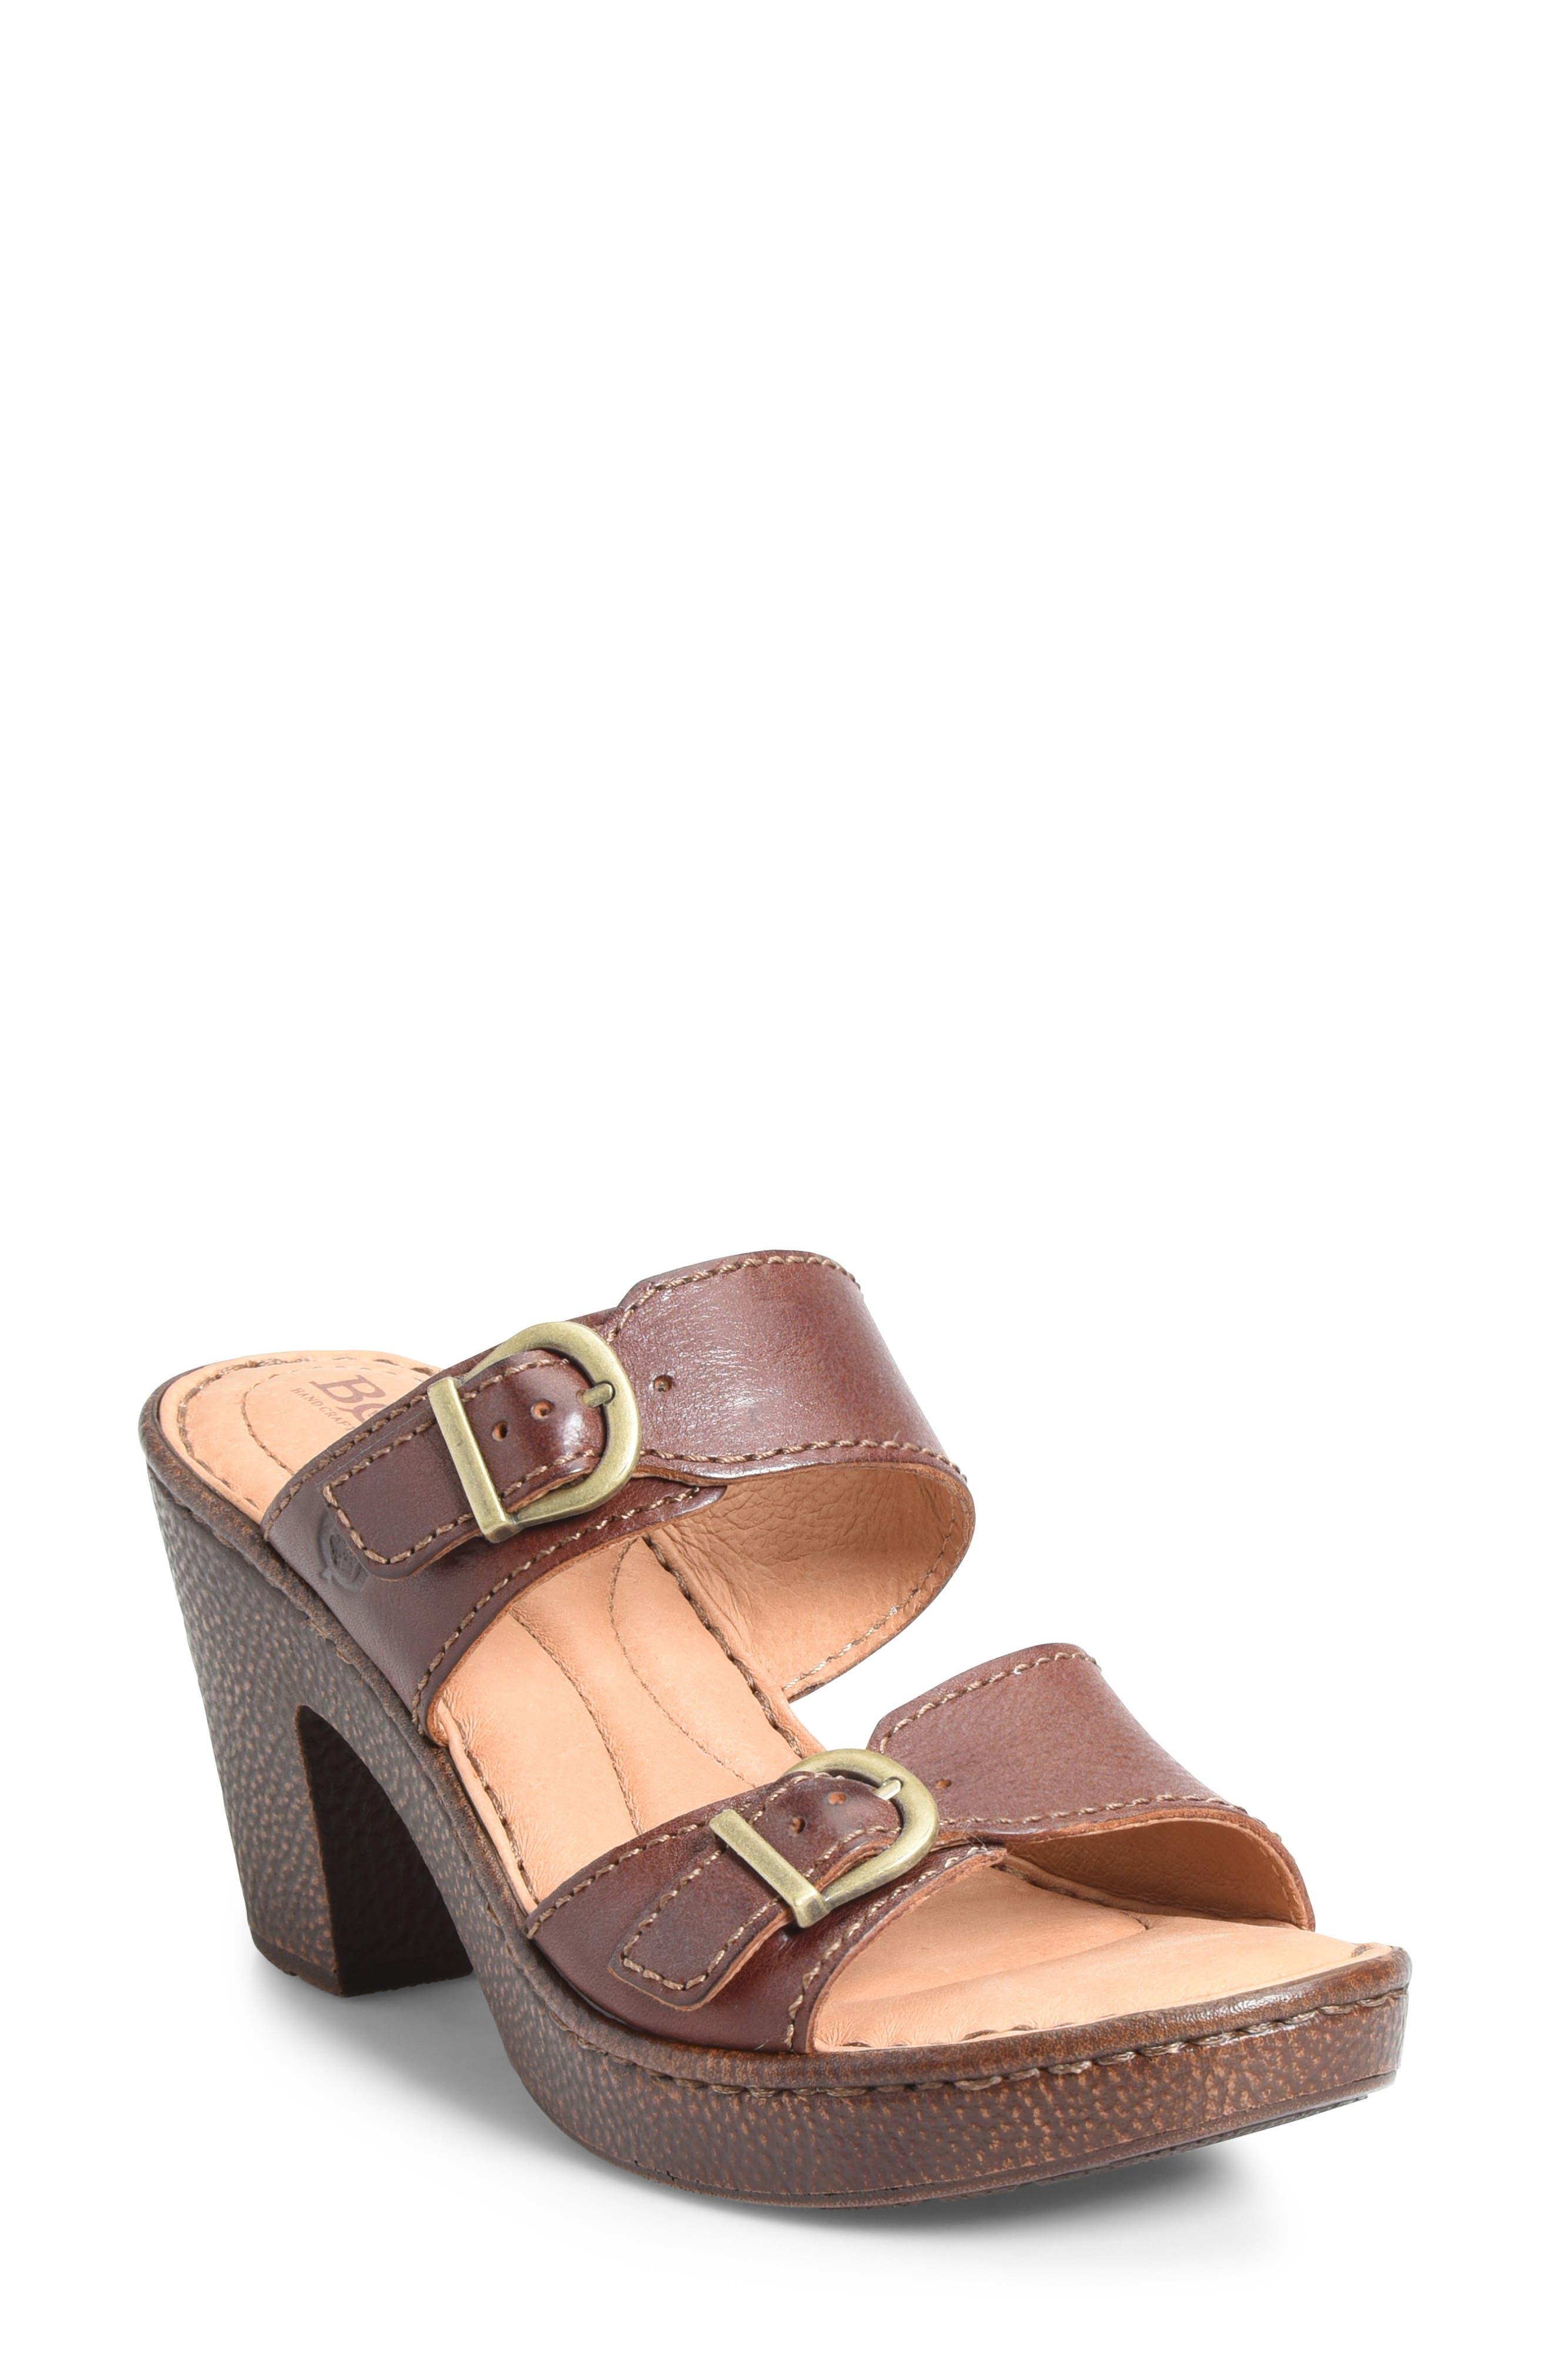 B?rn Wallowa Sandal, Brown